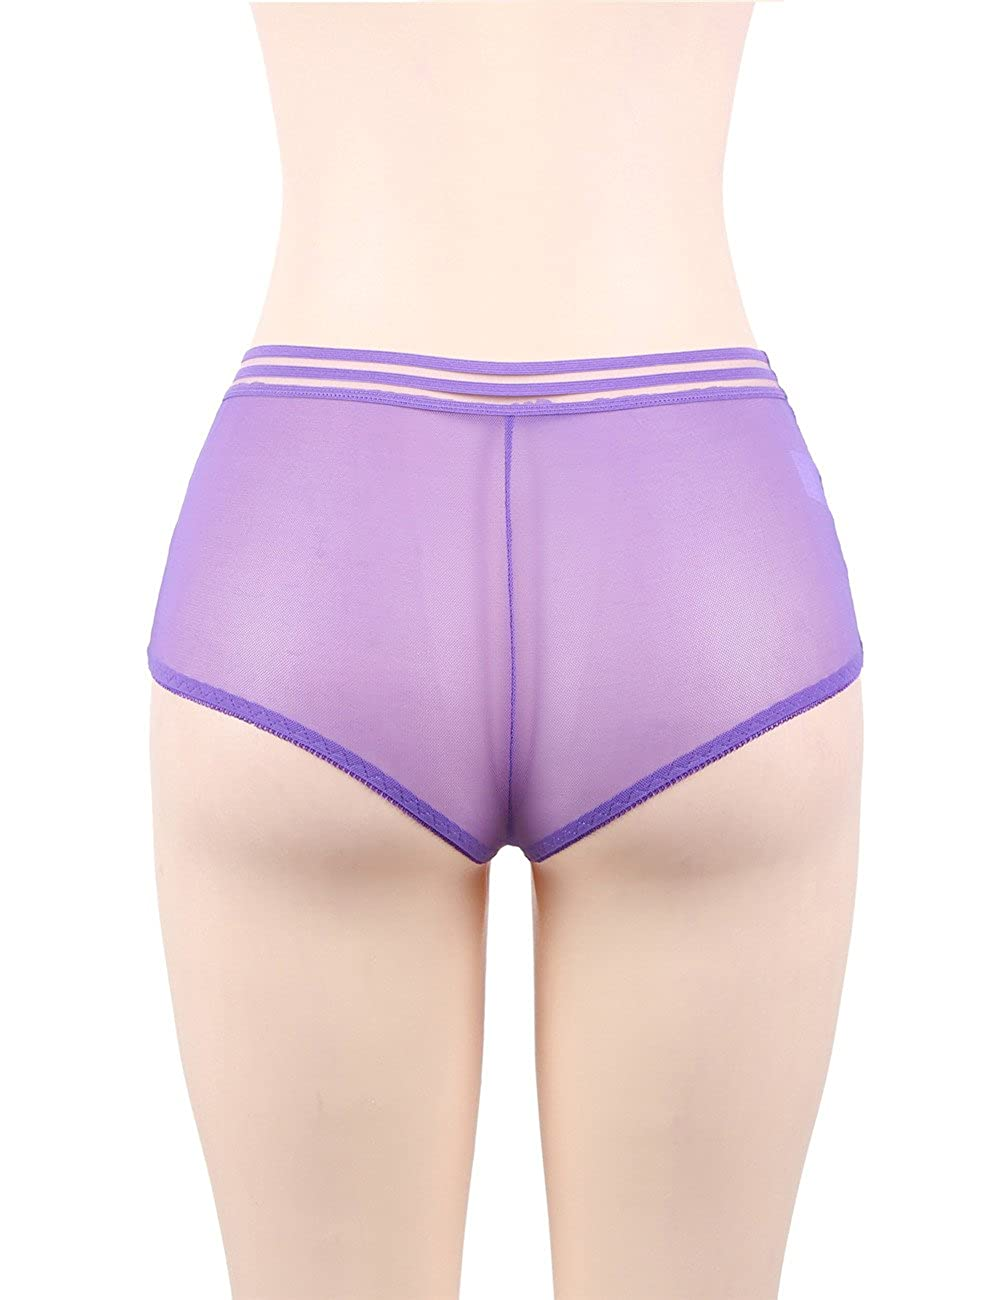 Oliveya Womens Mesh Panty Lace Underwear Soft Briefs High Waist Lingerie Hipster